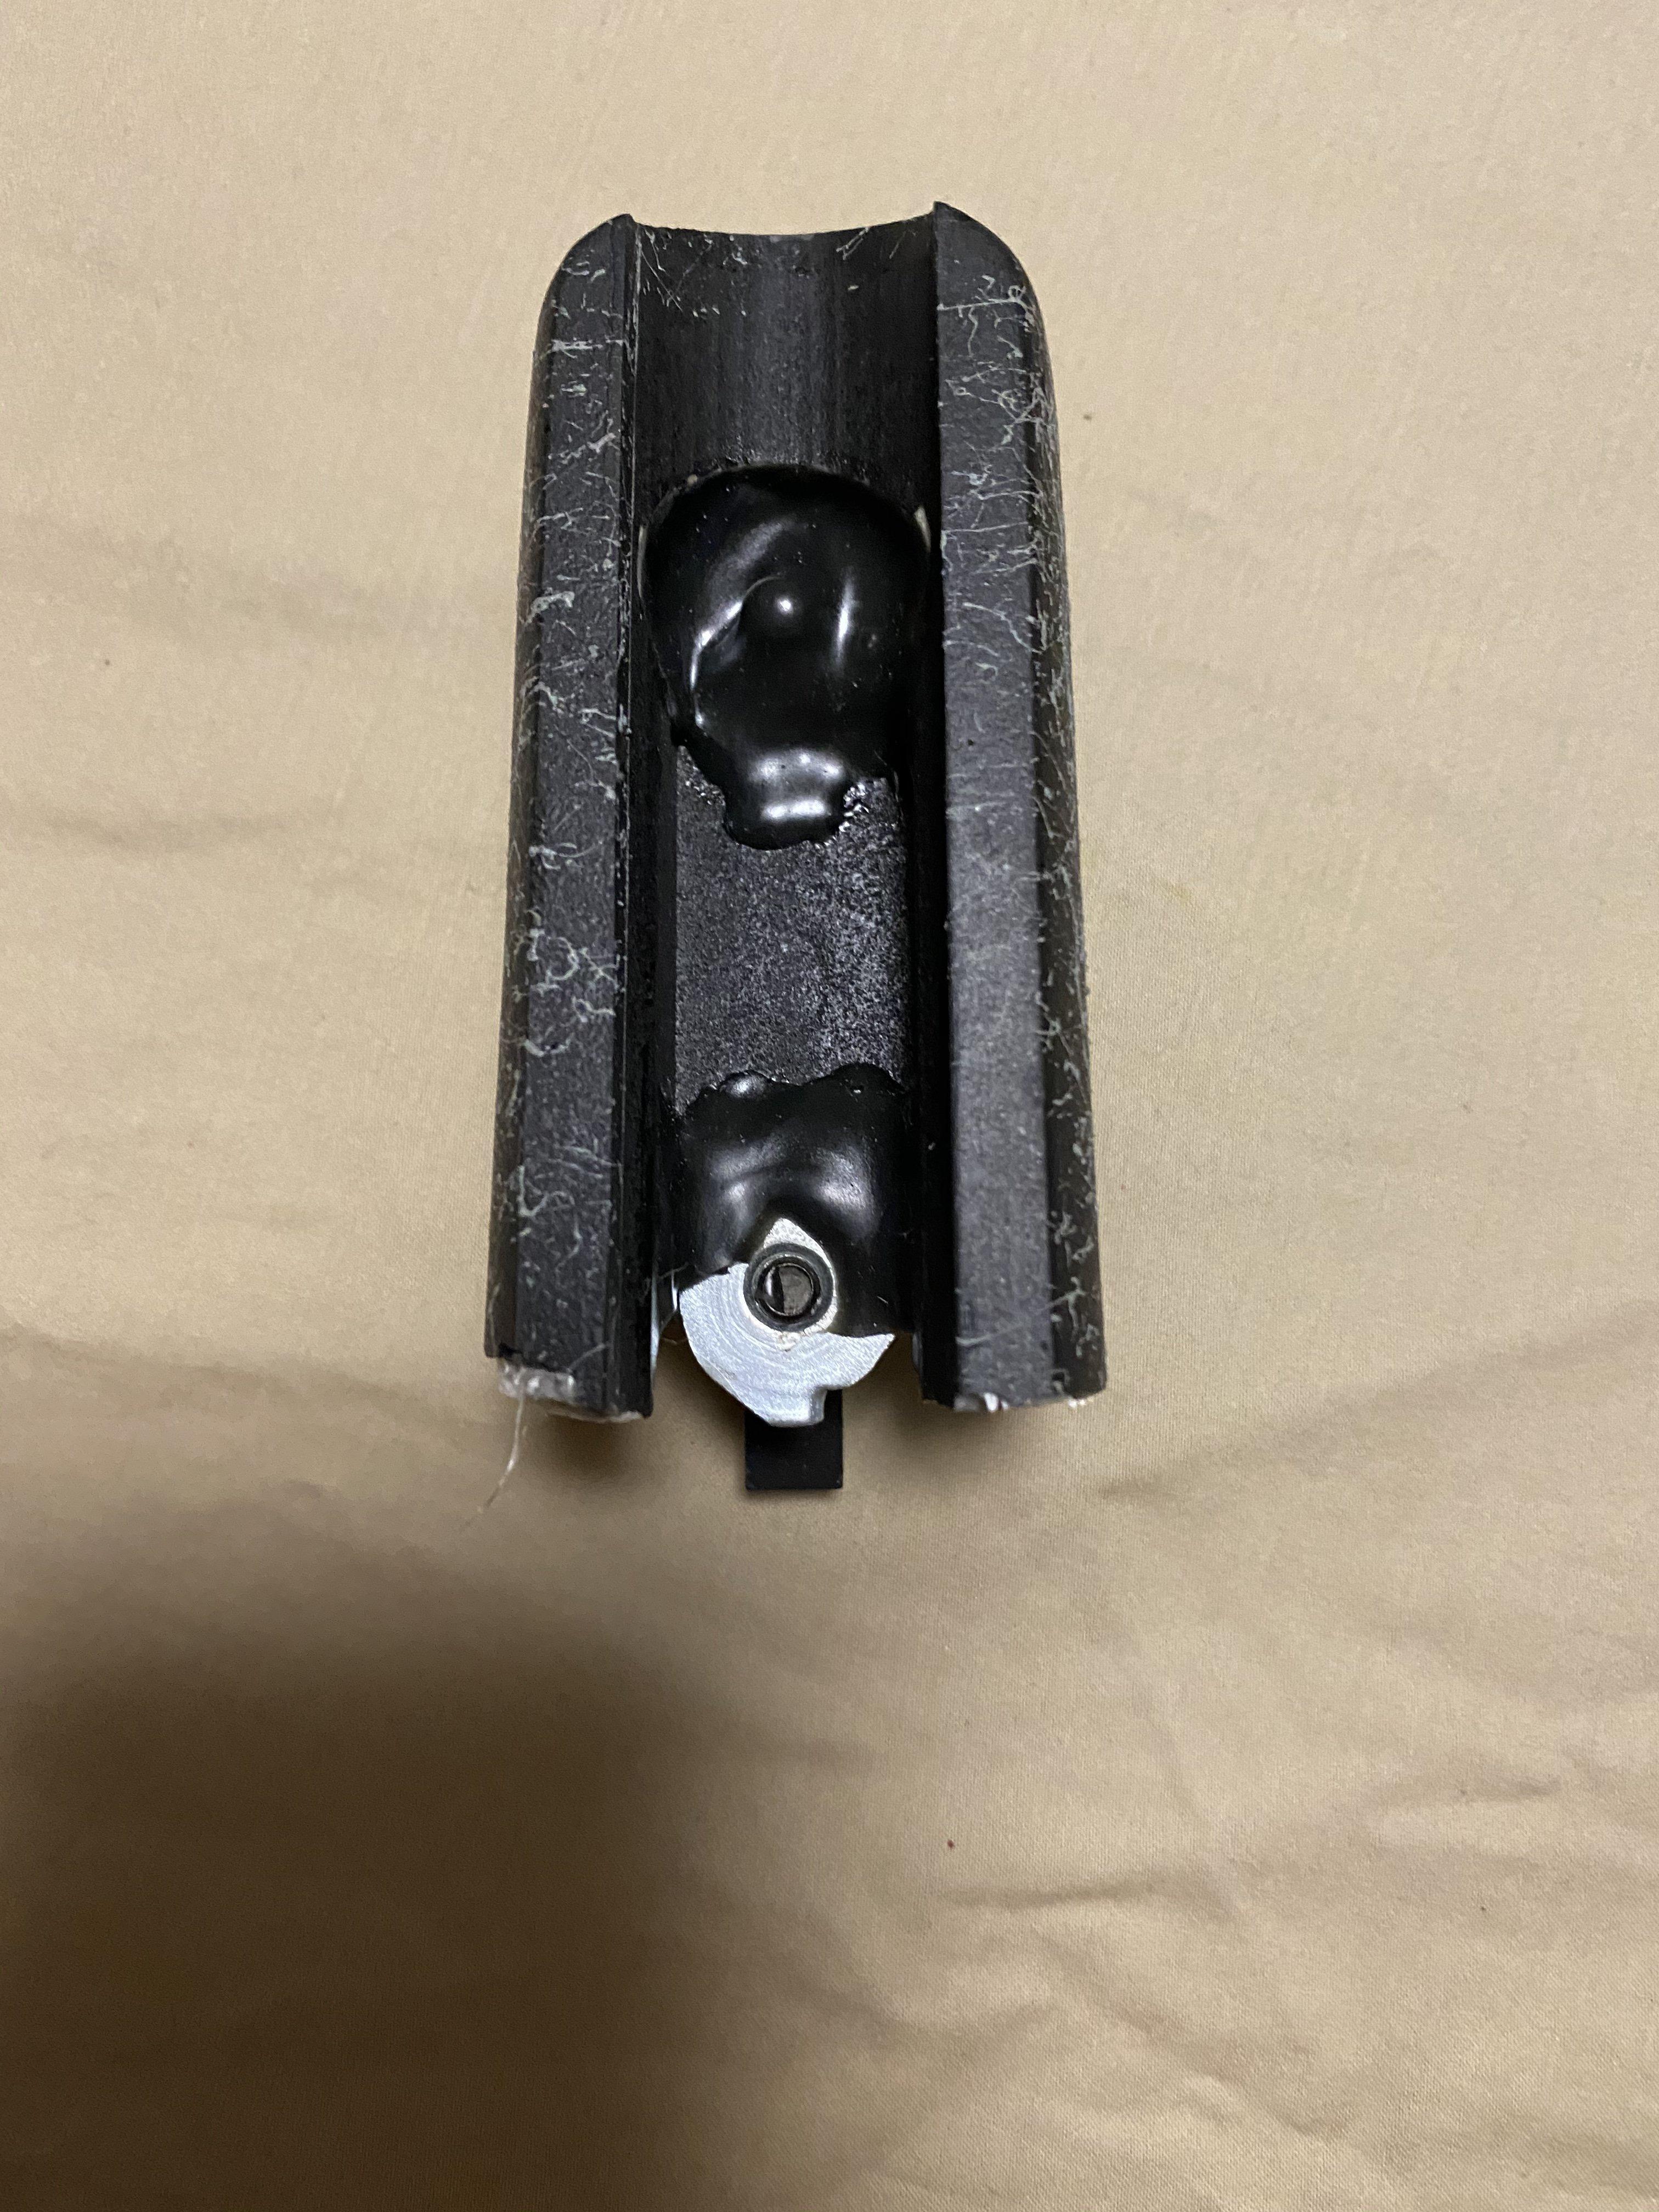 E3F49C3B-4175-43F9-8118-4A14B564981A.jpeg